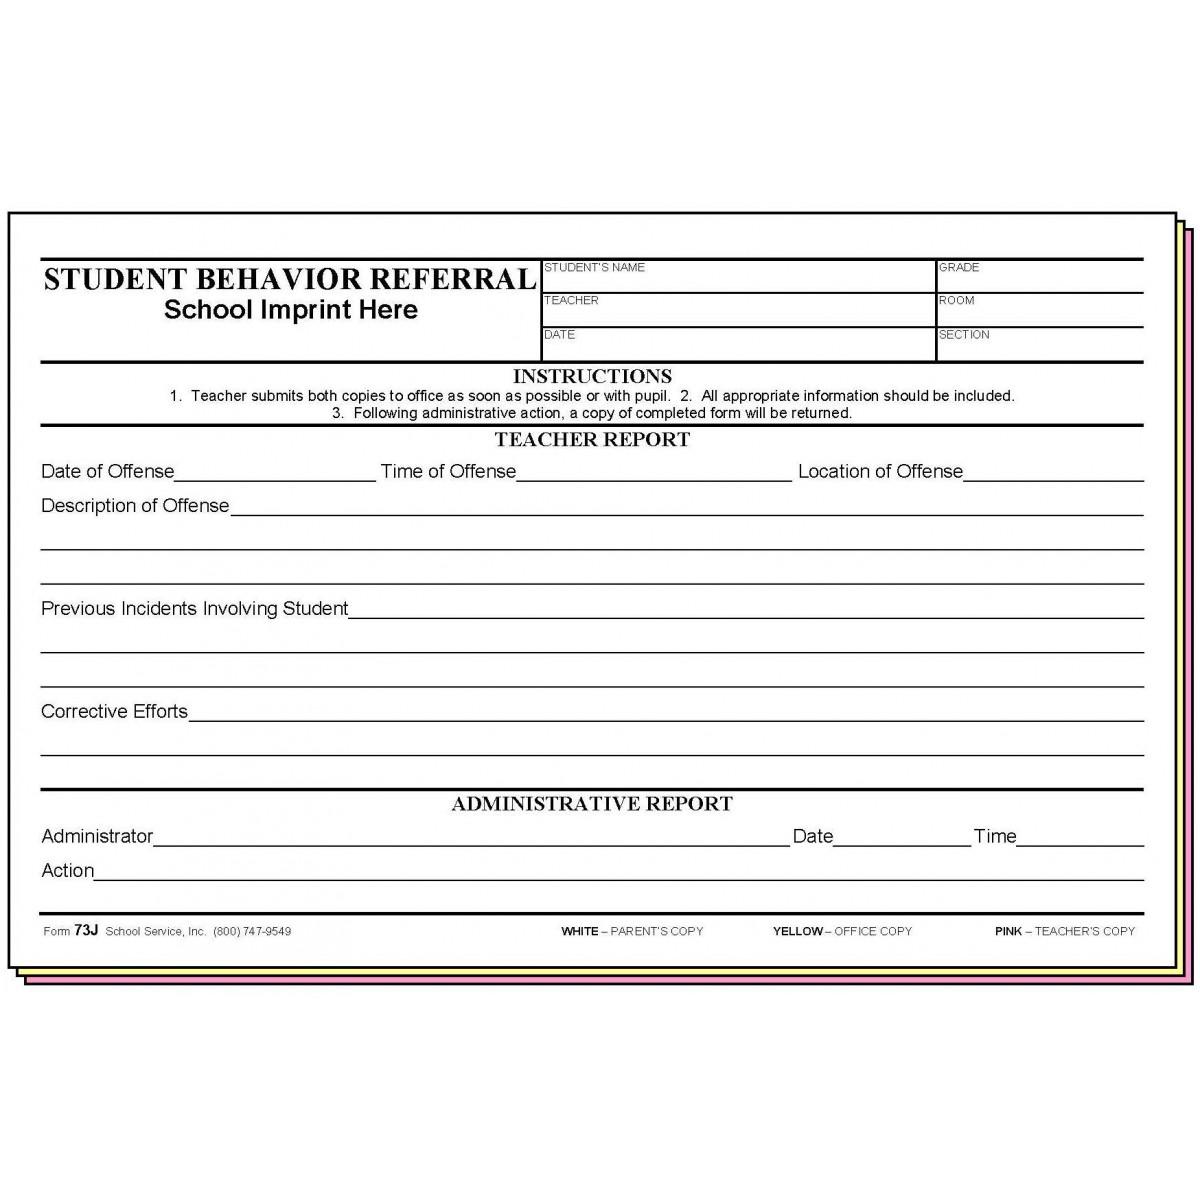 73j student behavior referral wschool imprint carbonless forms